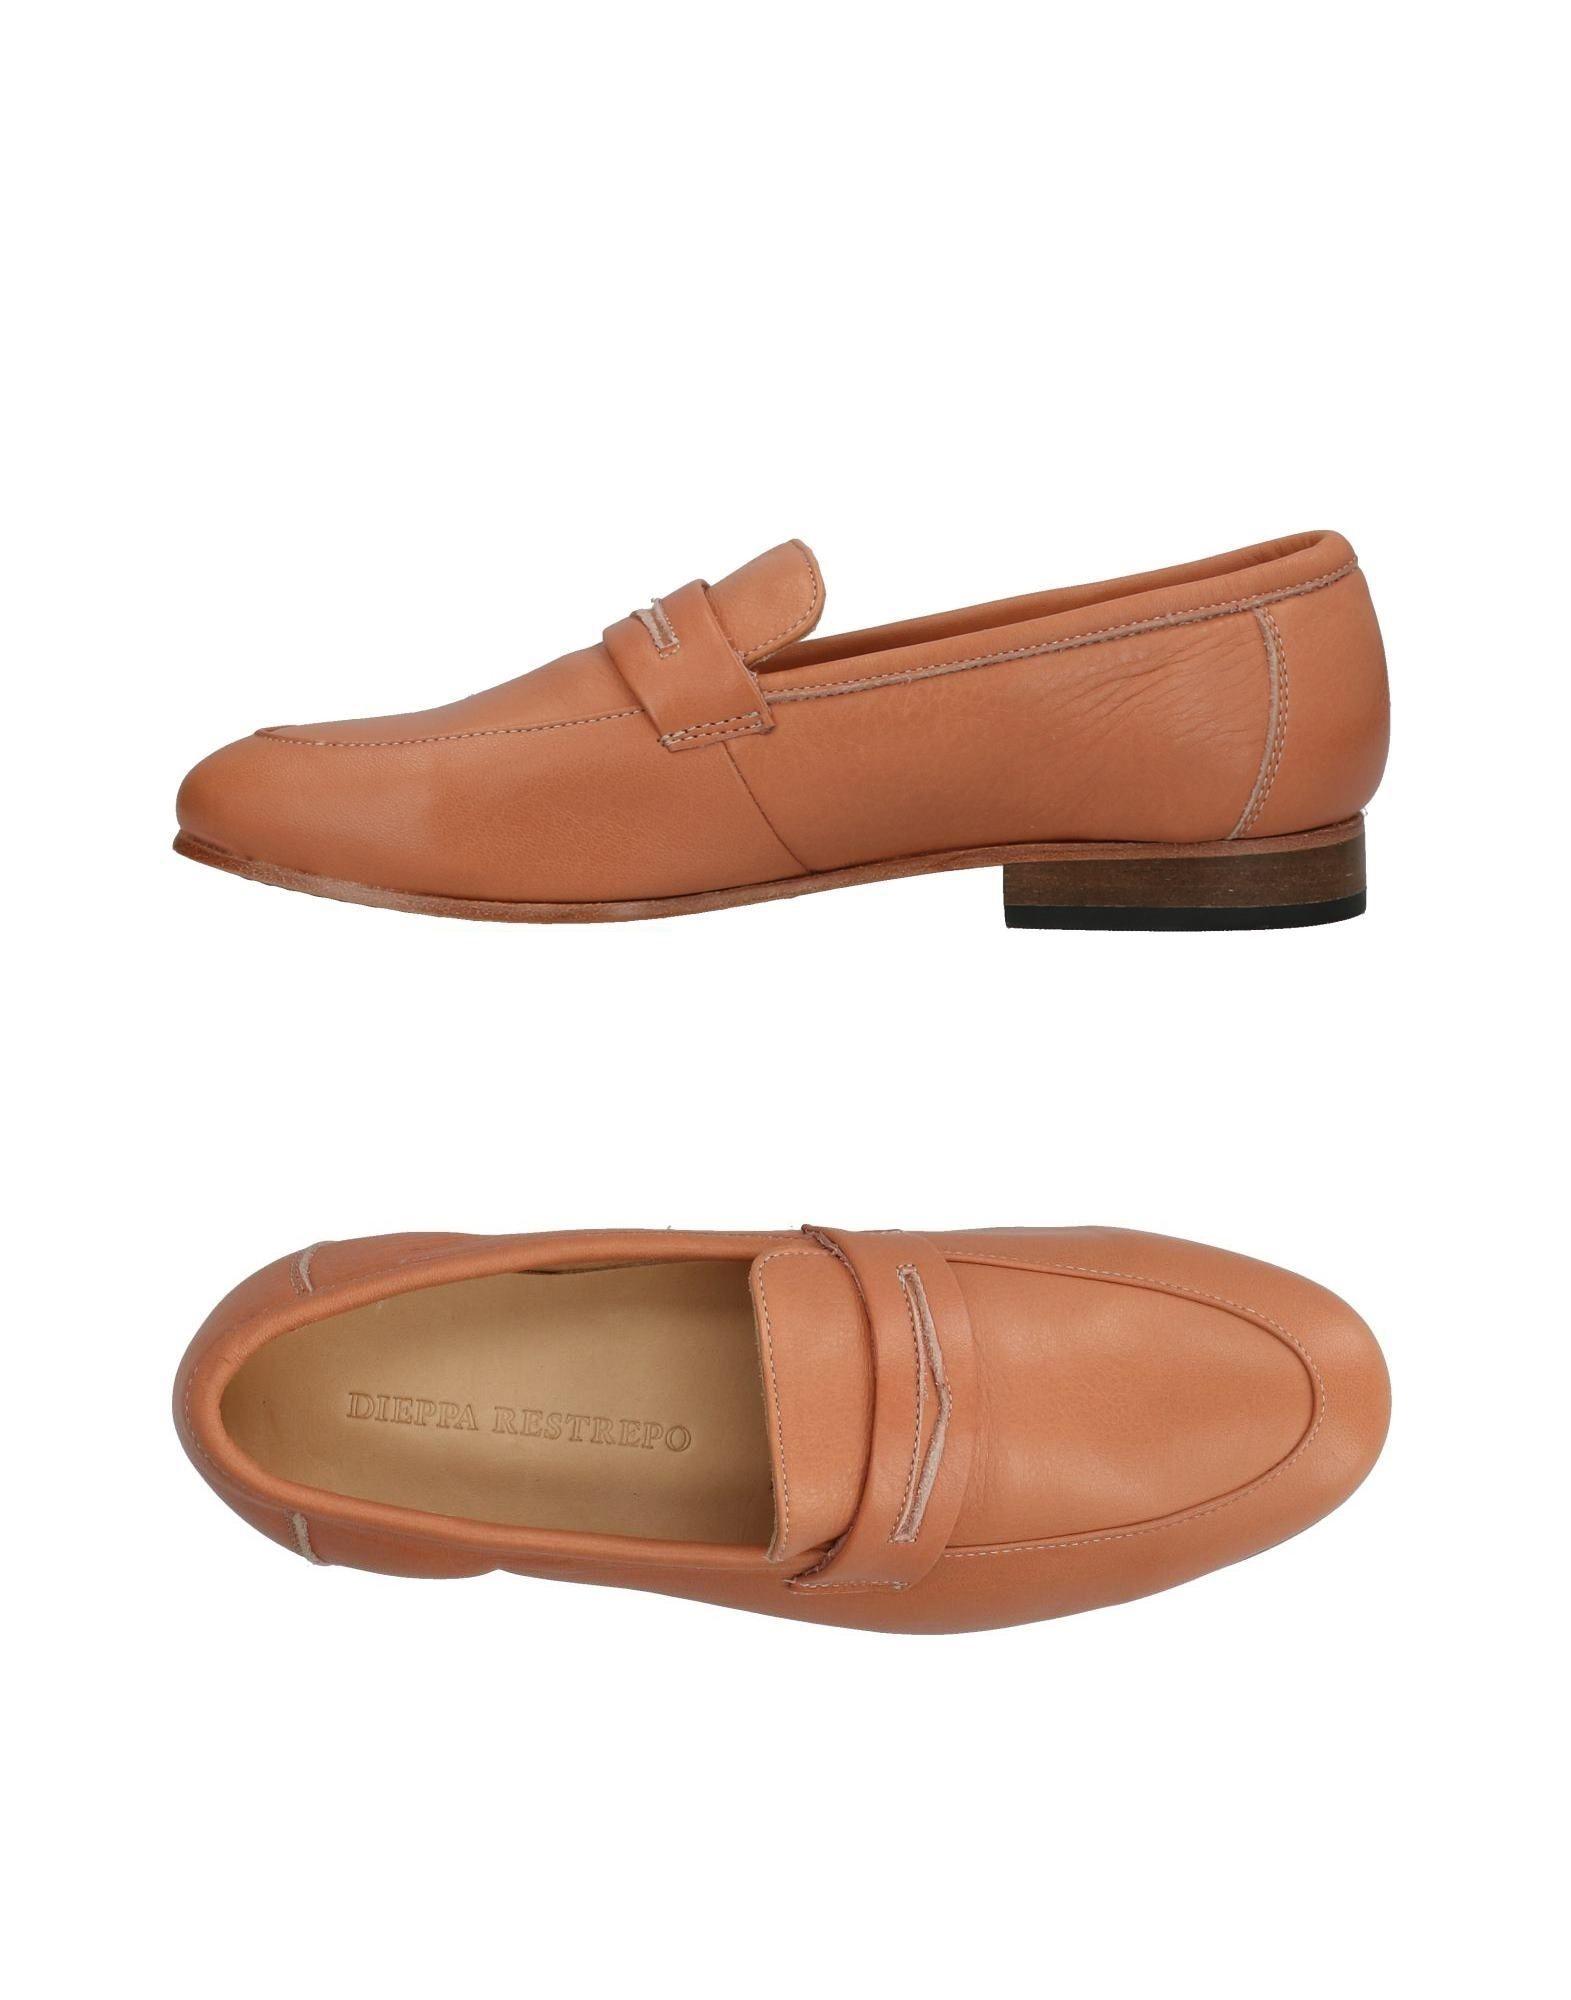 Dieppa Restrepo Mokassins Damen  11433628HO Gute Qualität beliebte Schuhe